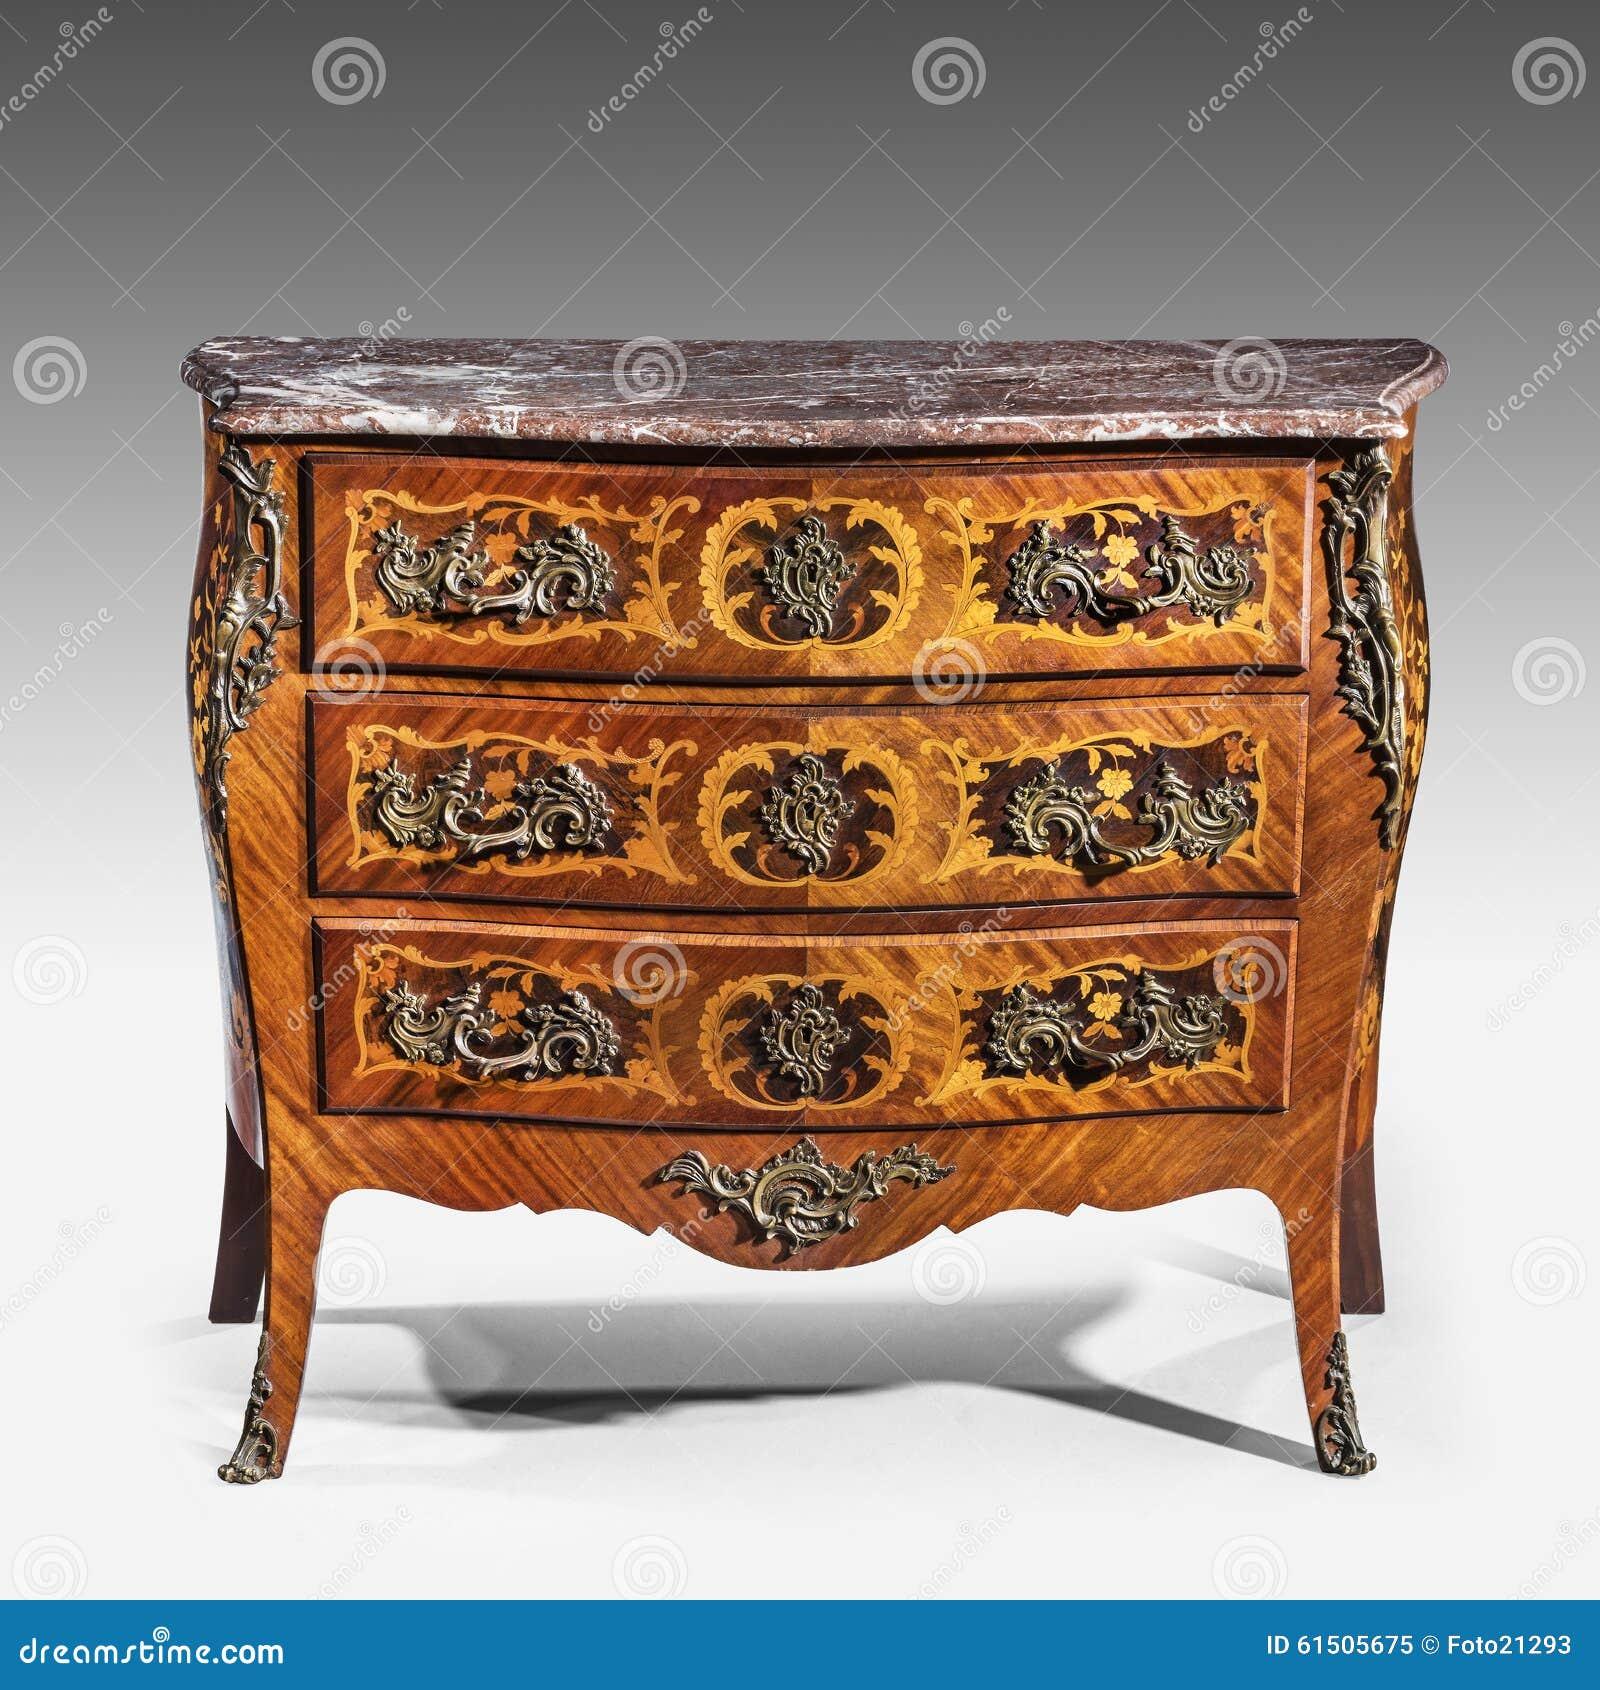 Classic old original elegant vintage wooden chest of drawers bur stock photo image 61505675 - Vintage pieces of furniture old times elegance ...